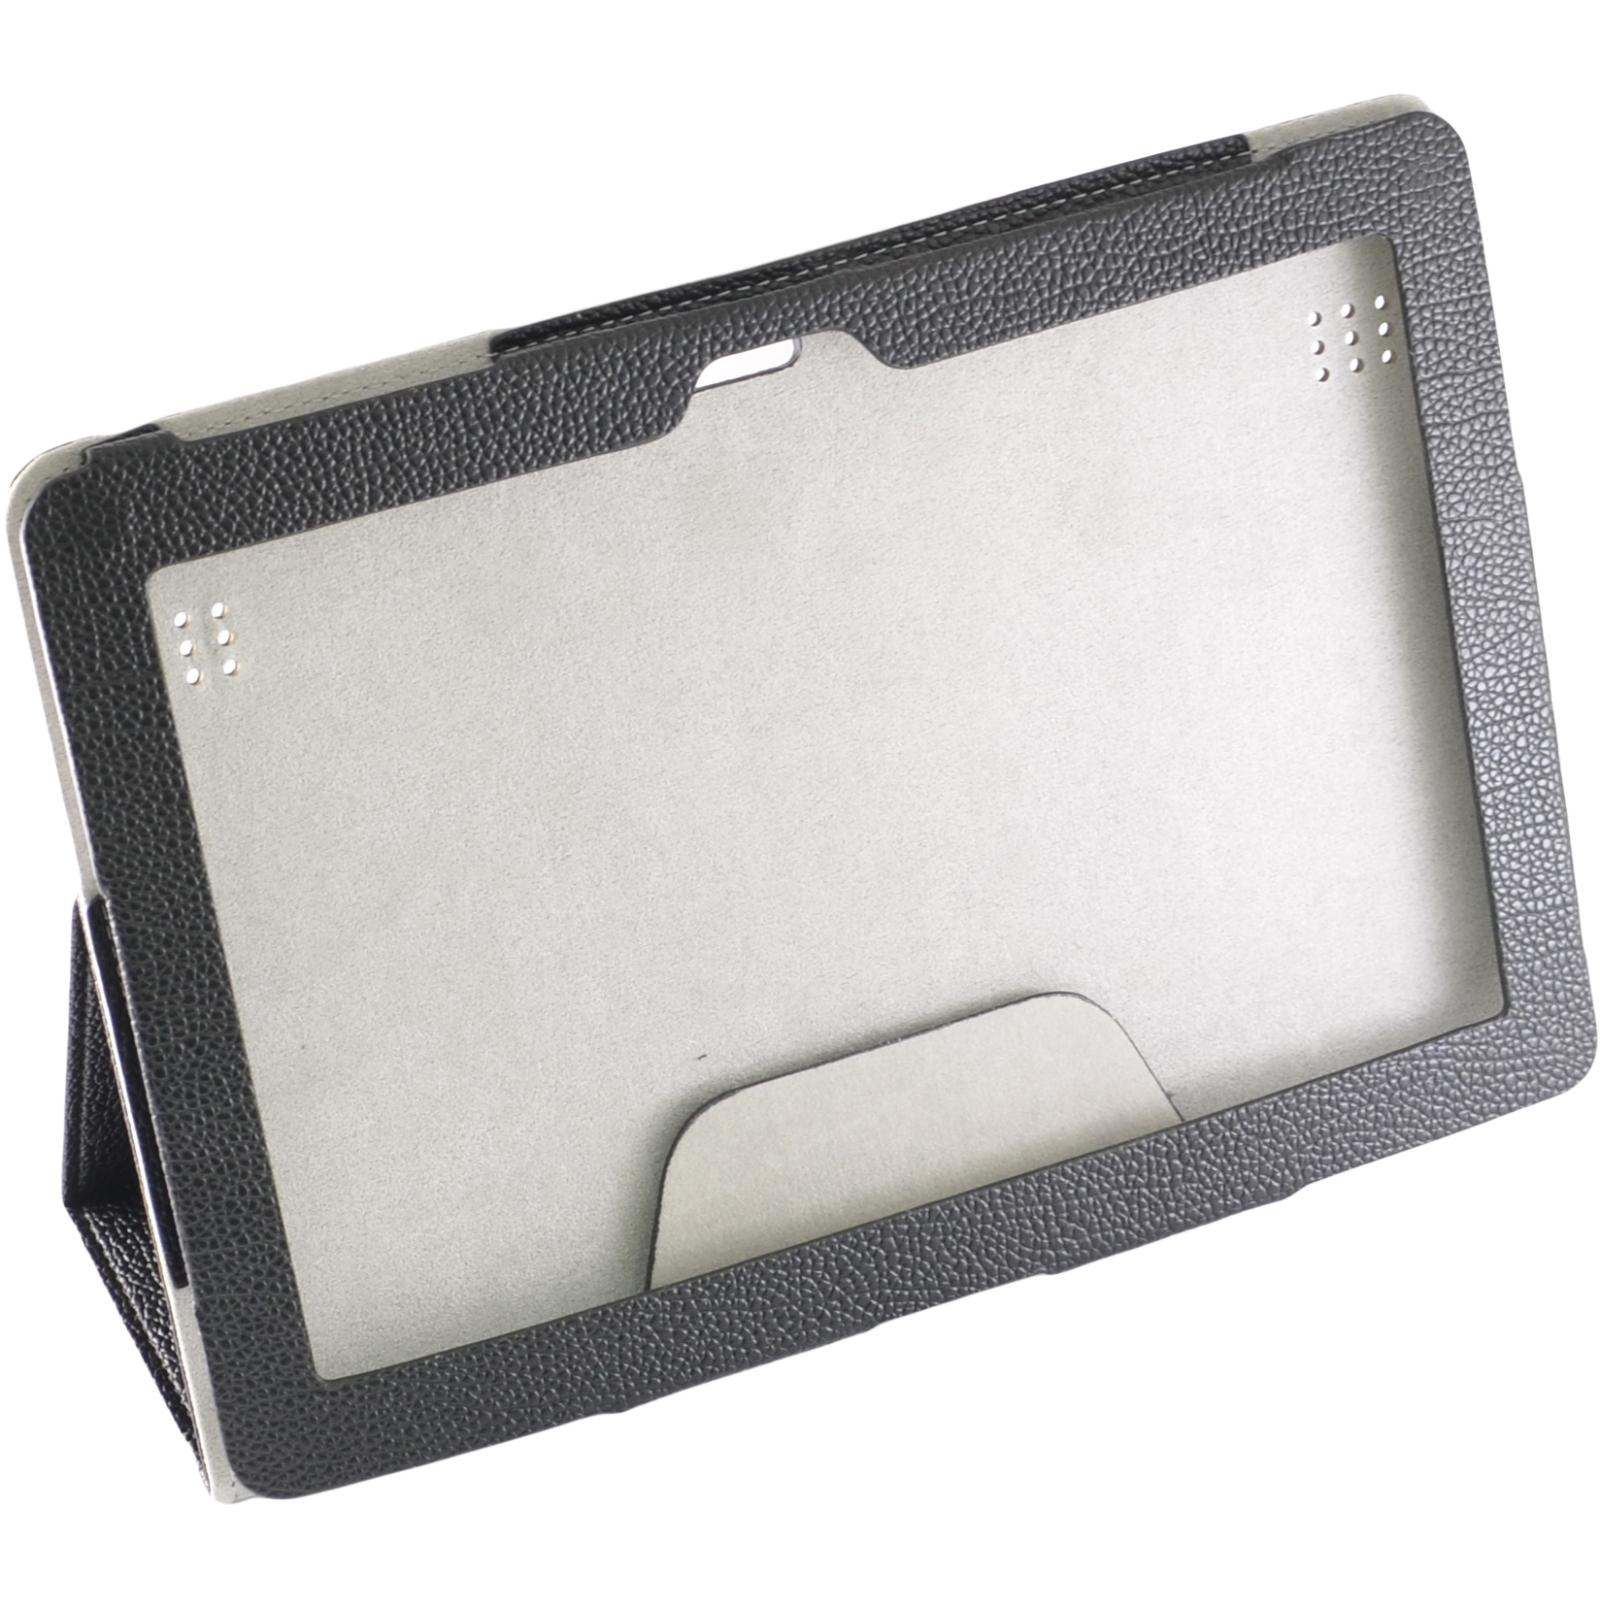 Чехол для планшета Pro-case Huawei MediaPad 10 Link S10-201u (HuawMP S10-201) изображение 3